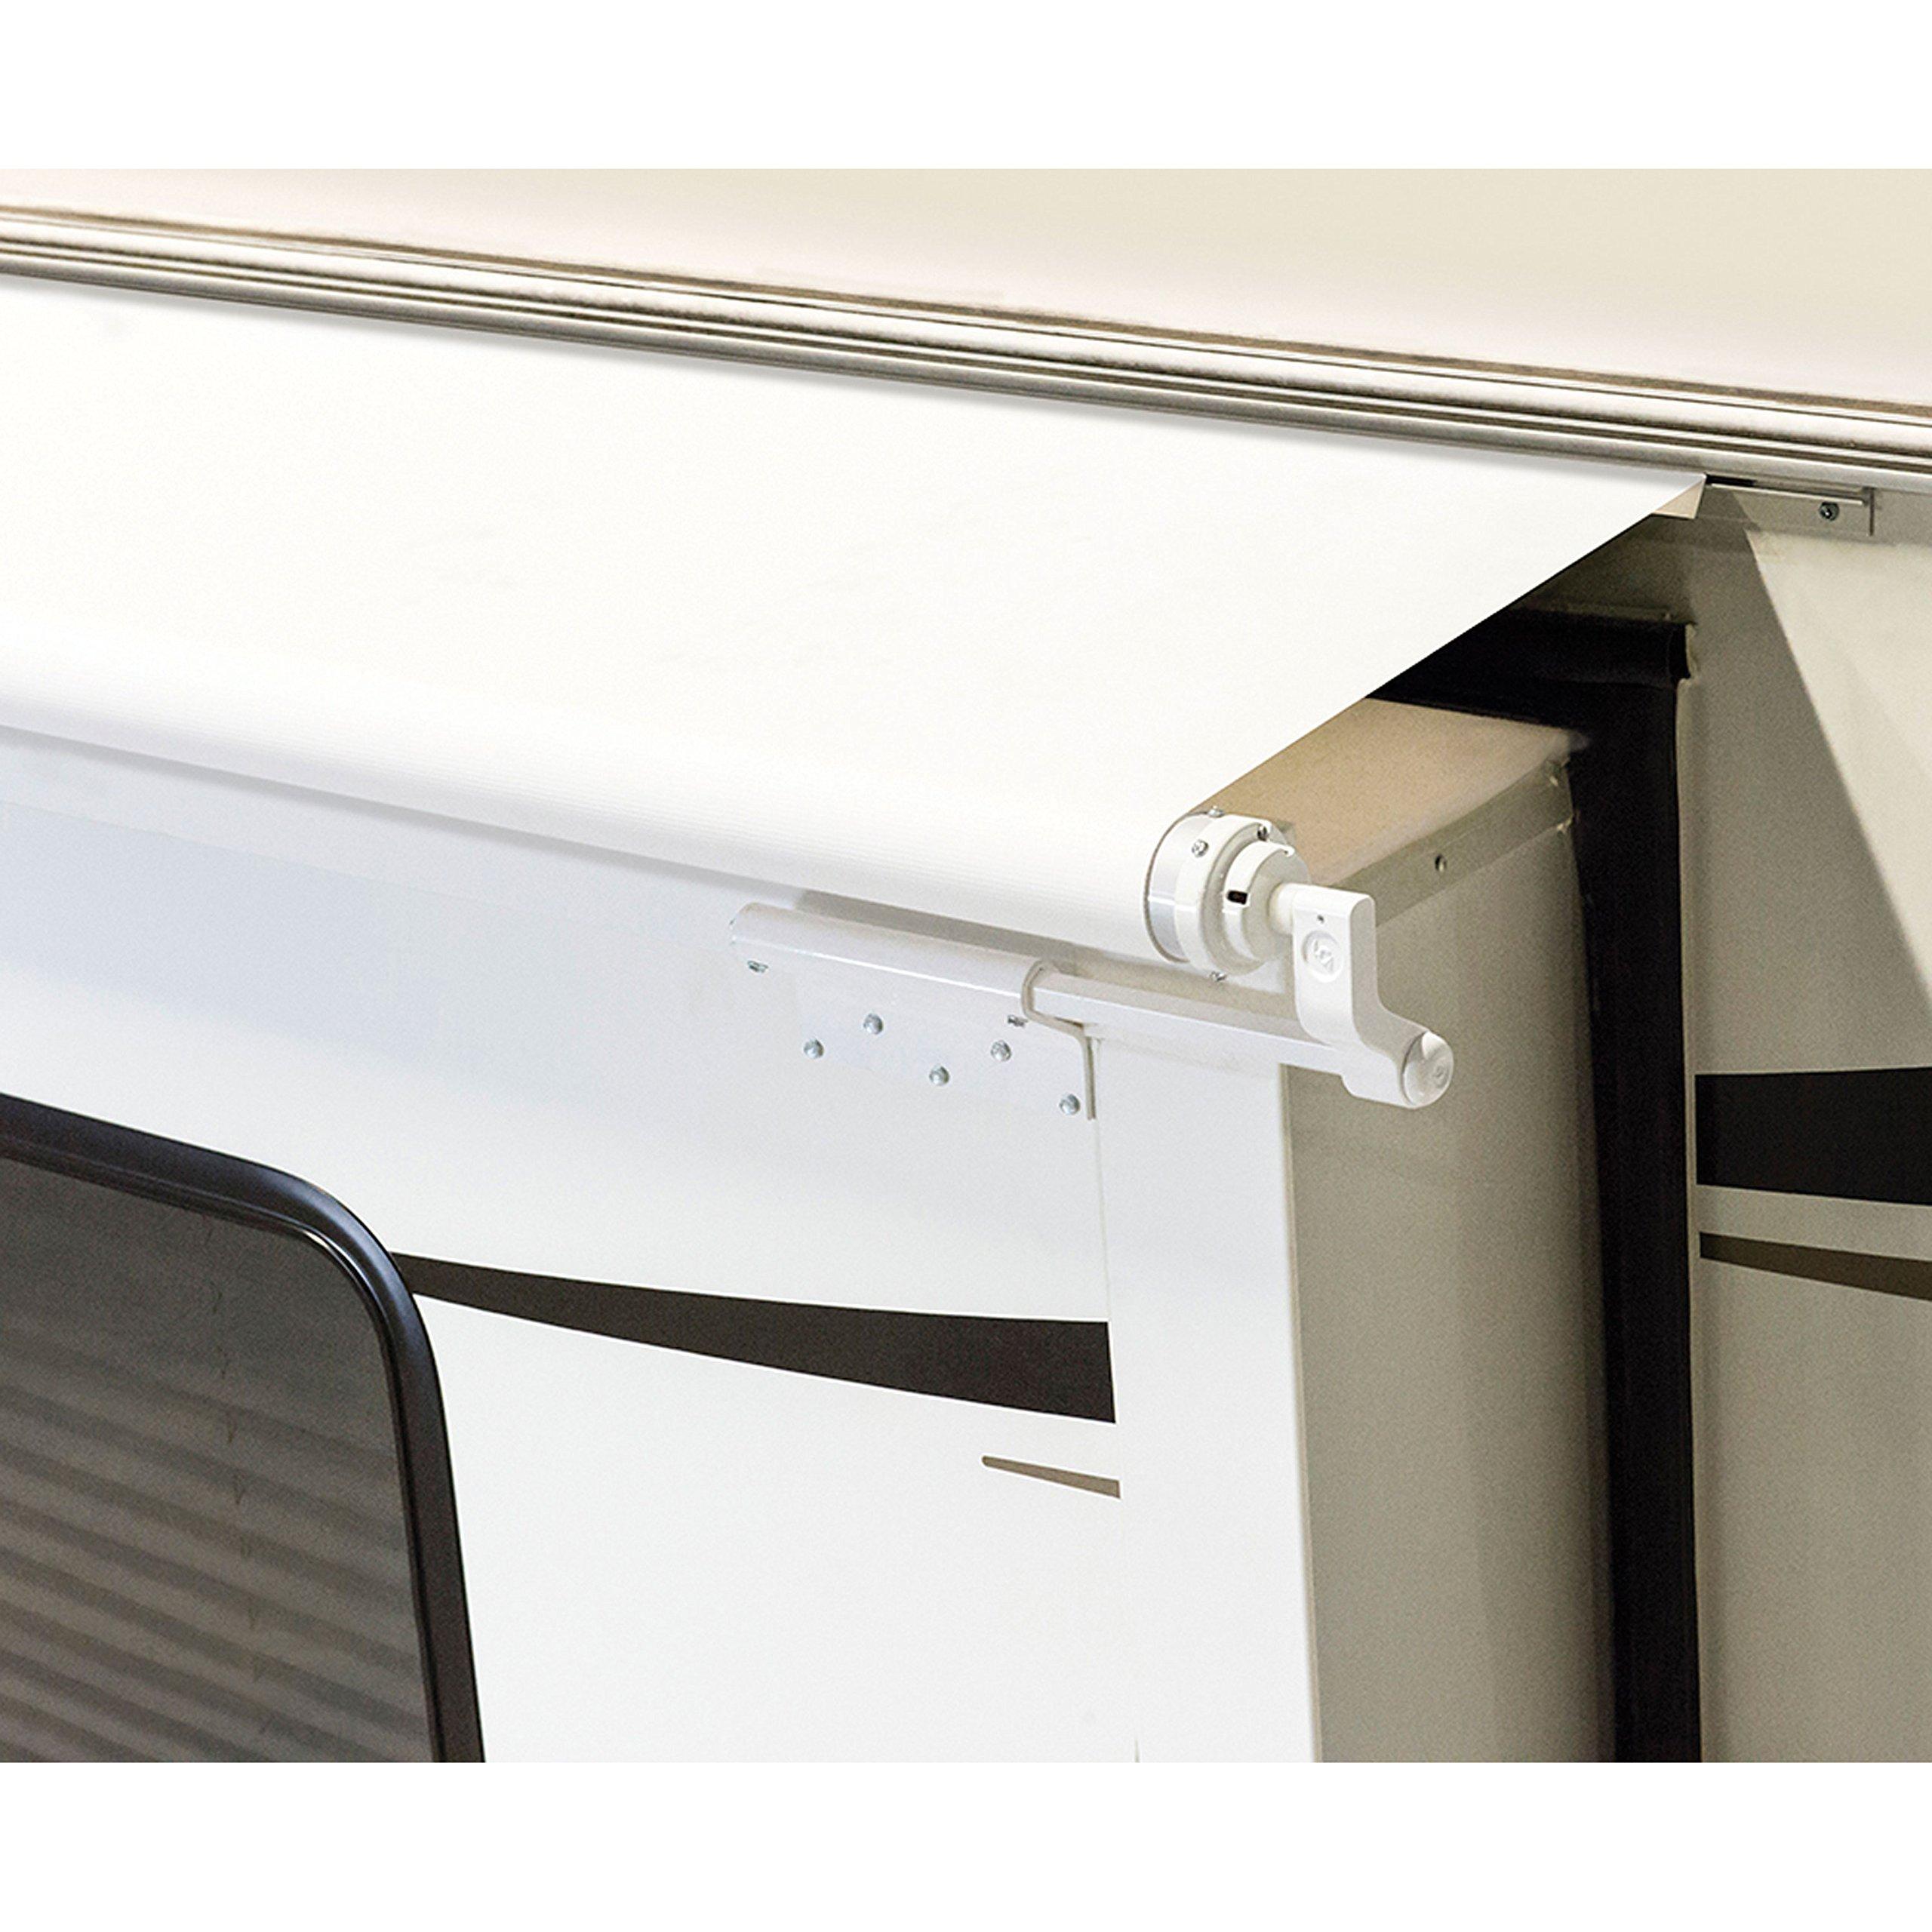 Lippert RV Solera Awning 12' Slider White V000139496